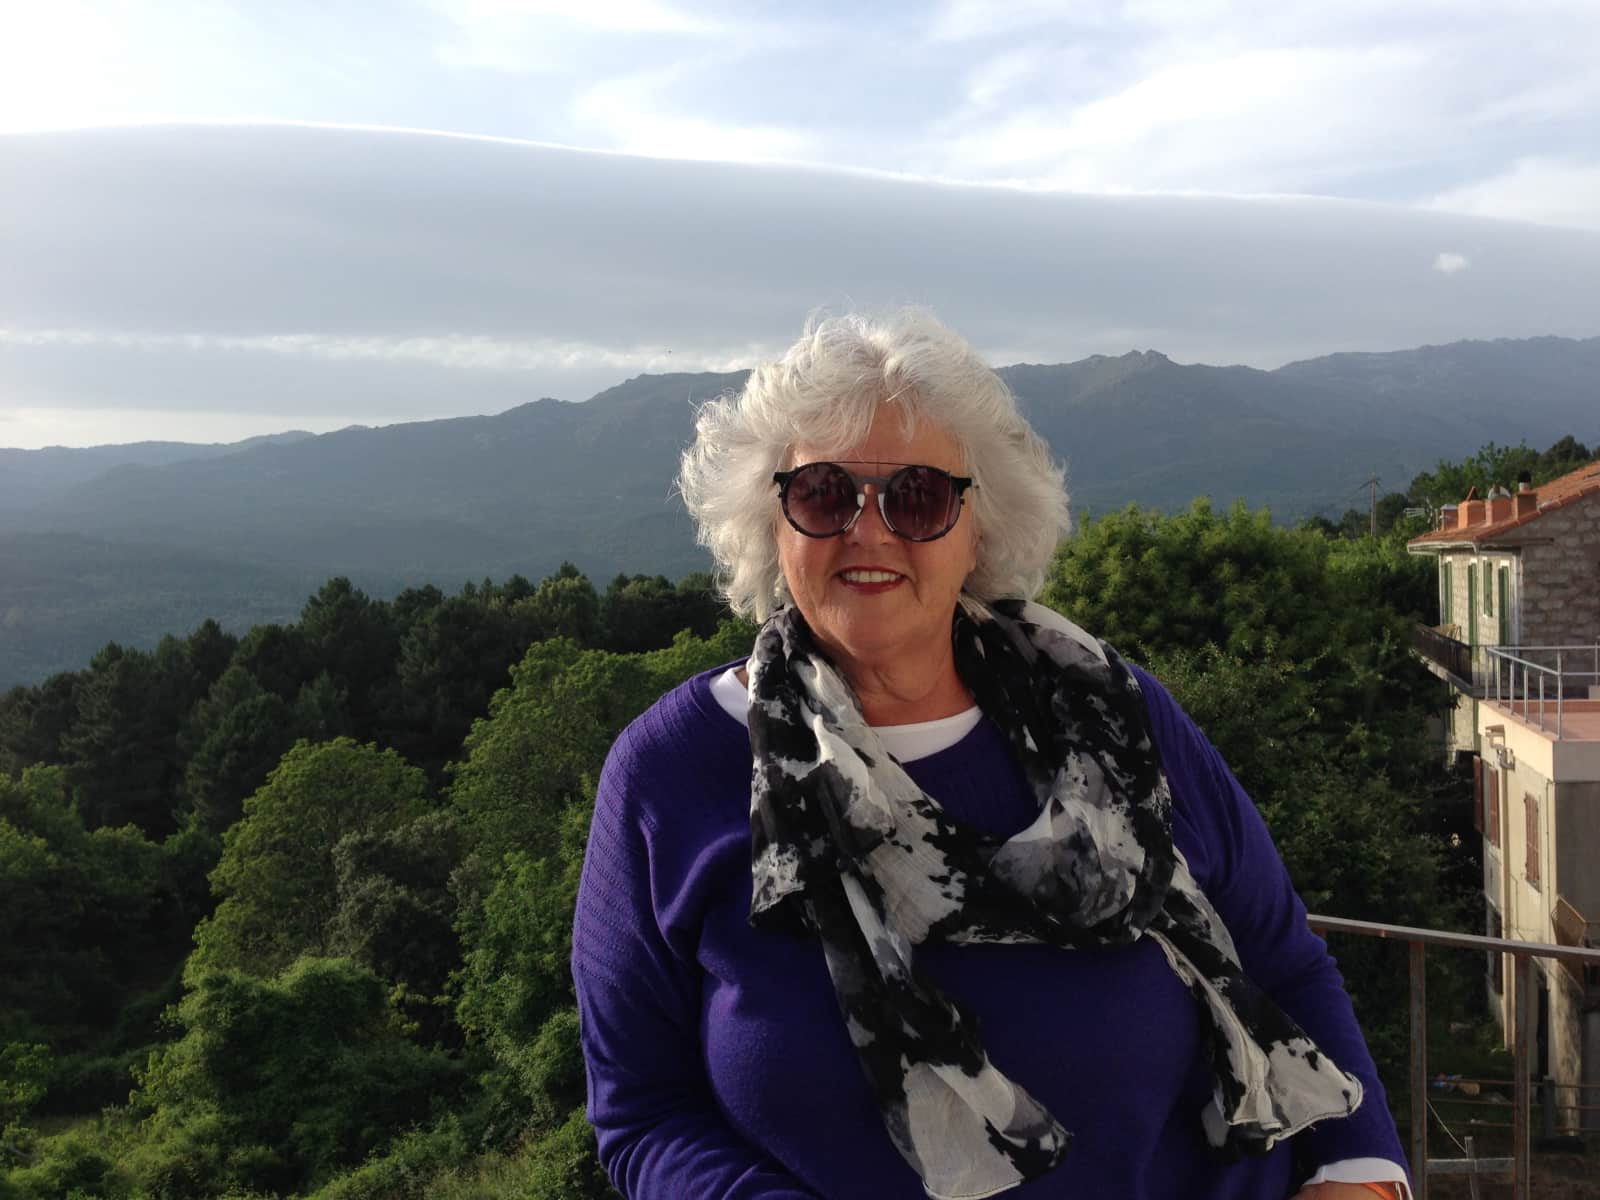 Susan from Perth, Western Australia, Australia